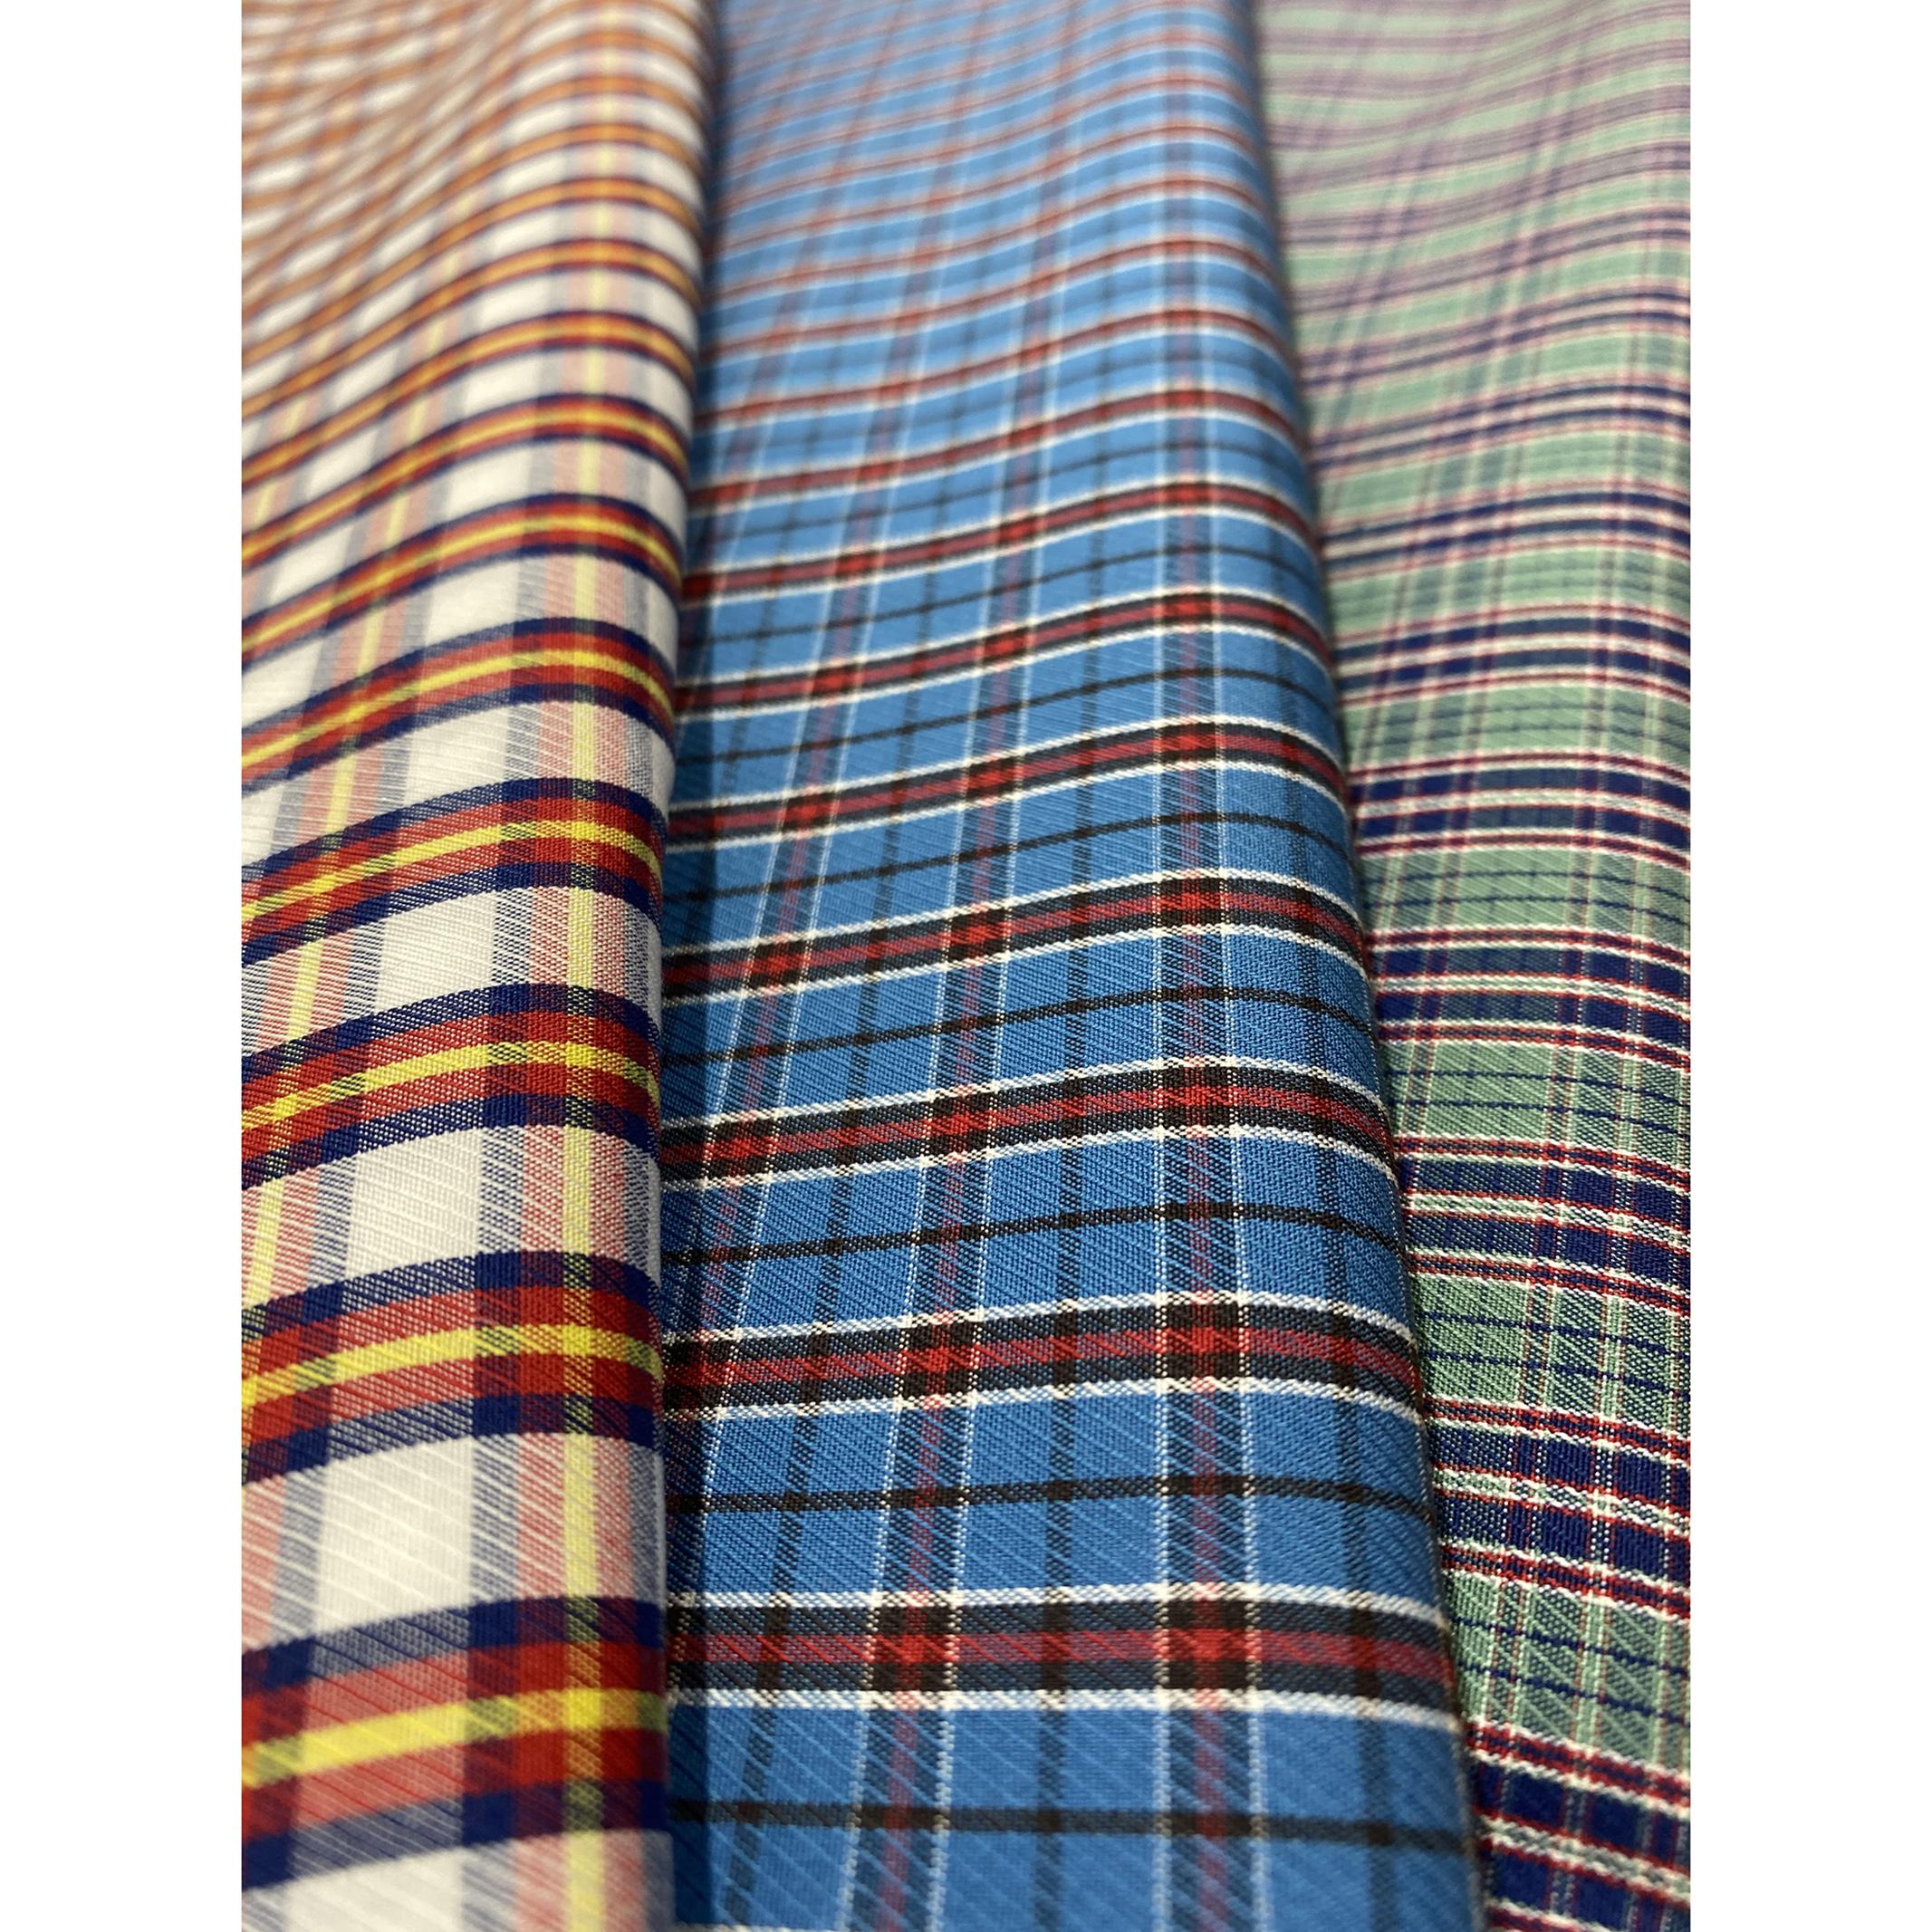 Wholesale shrink resistant custom printed bulk cotton poplin fabric